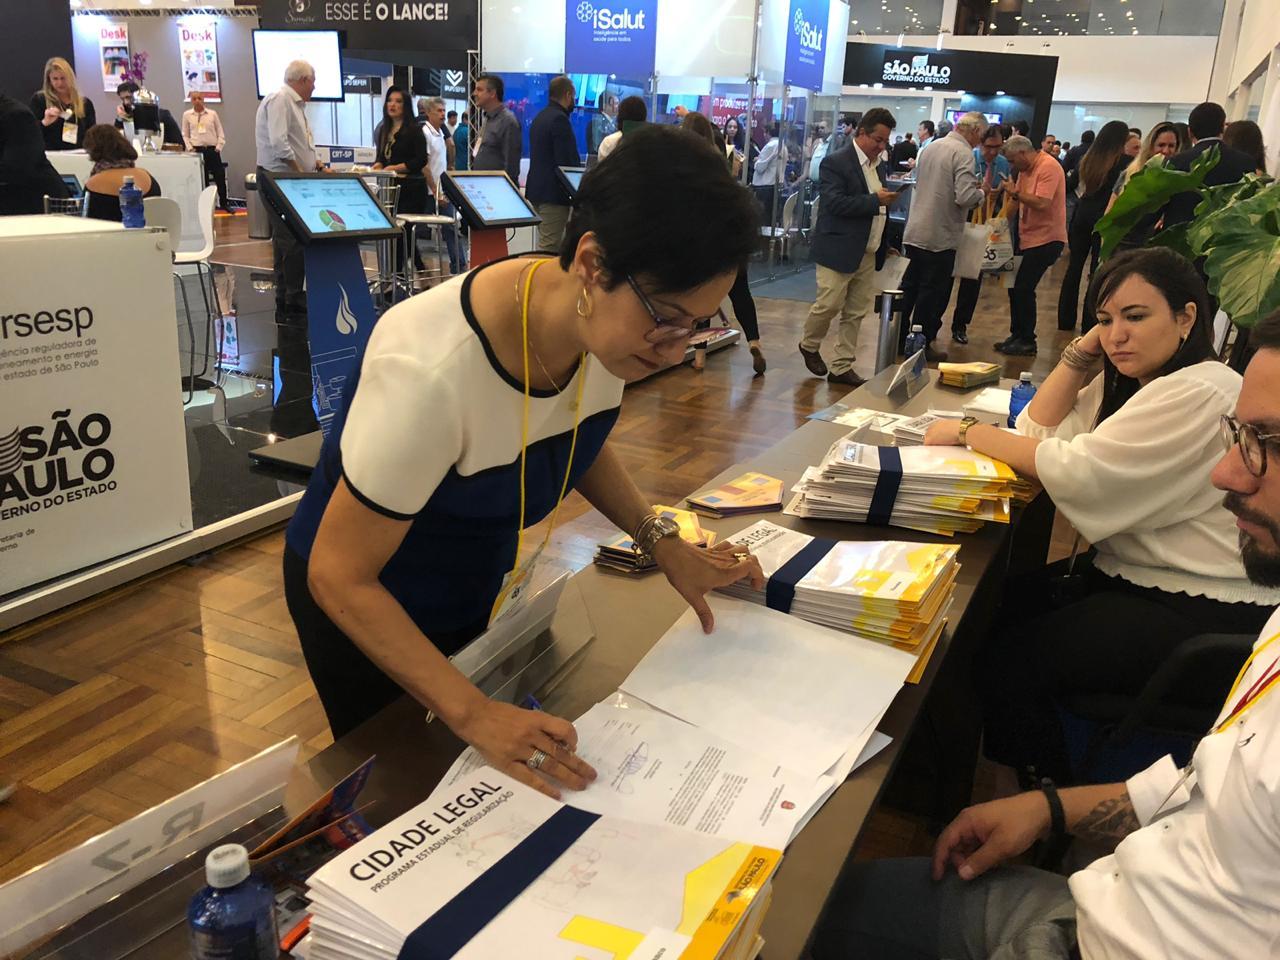 Sorocaba assina convênios de programas habitacionais no Congresso de Municípios